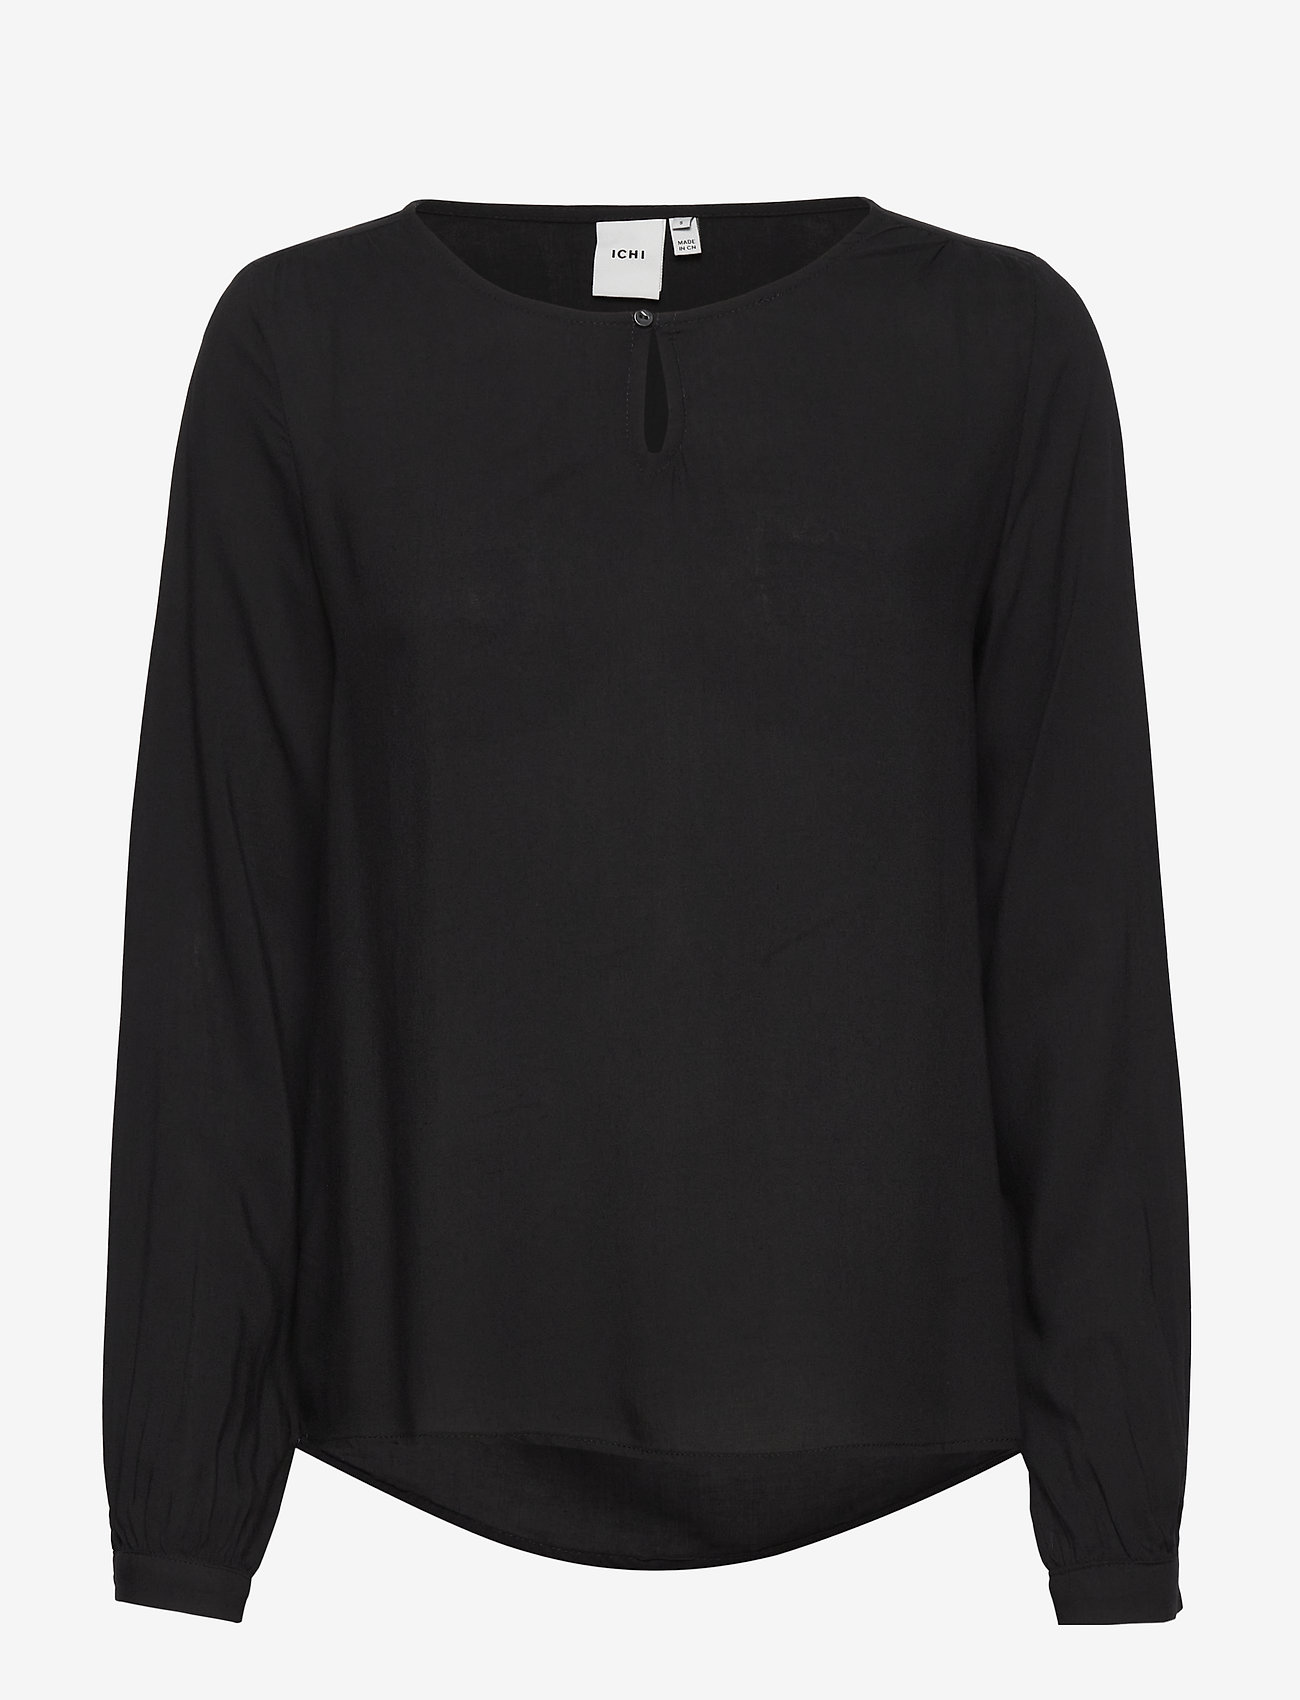 ICHI - IHMAJA LS - long sleeved blouses - black - 0